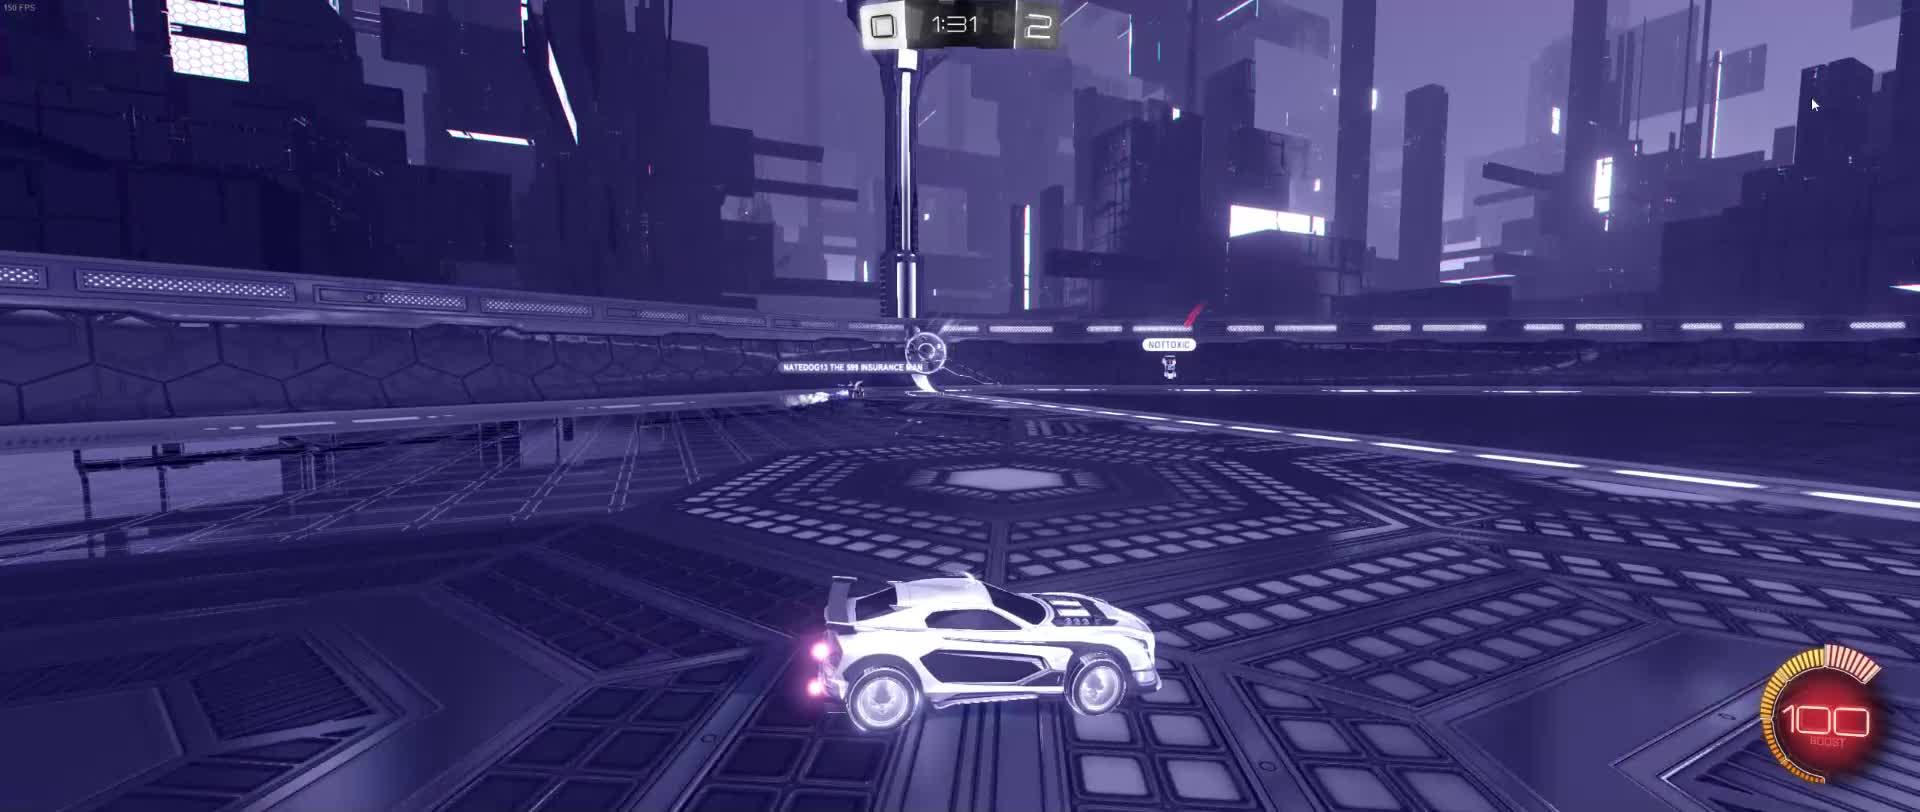 RocketLeague, Confusing Dropshot GIFs